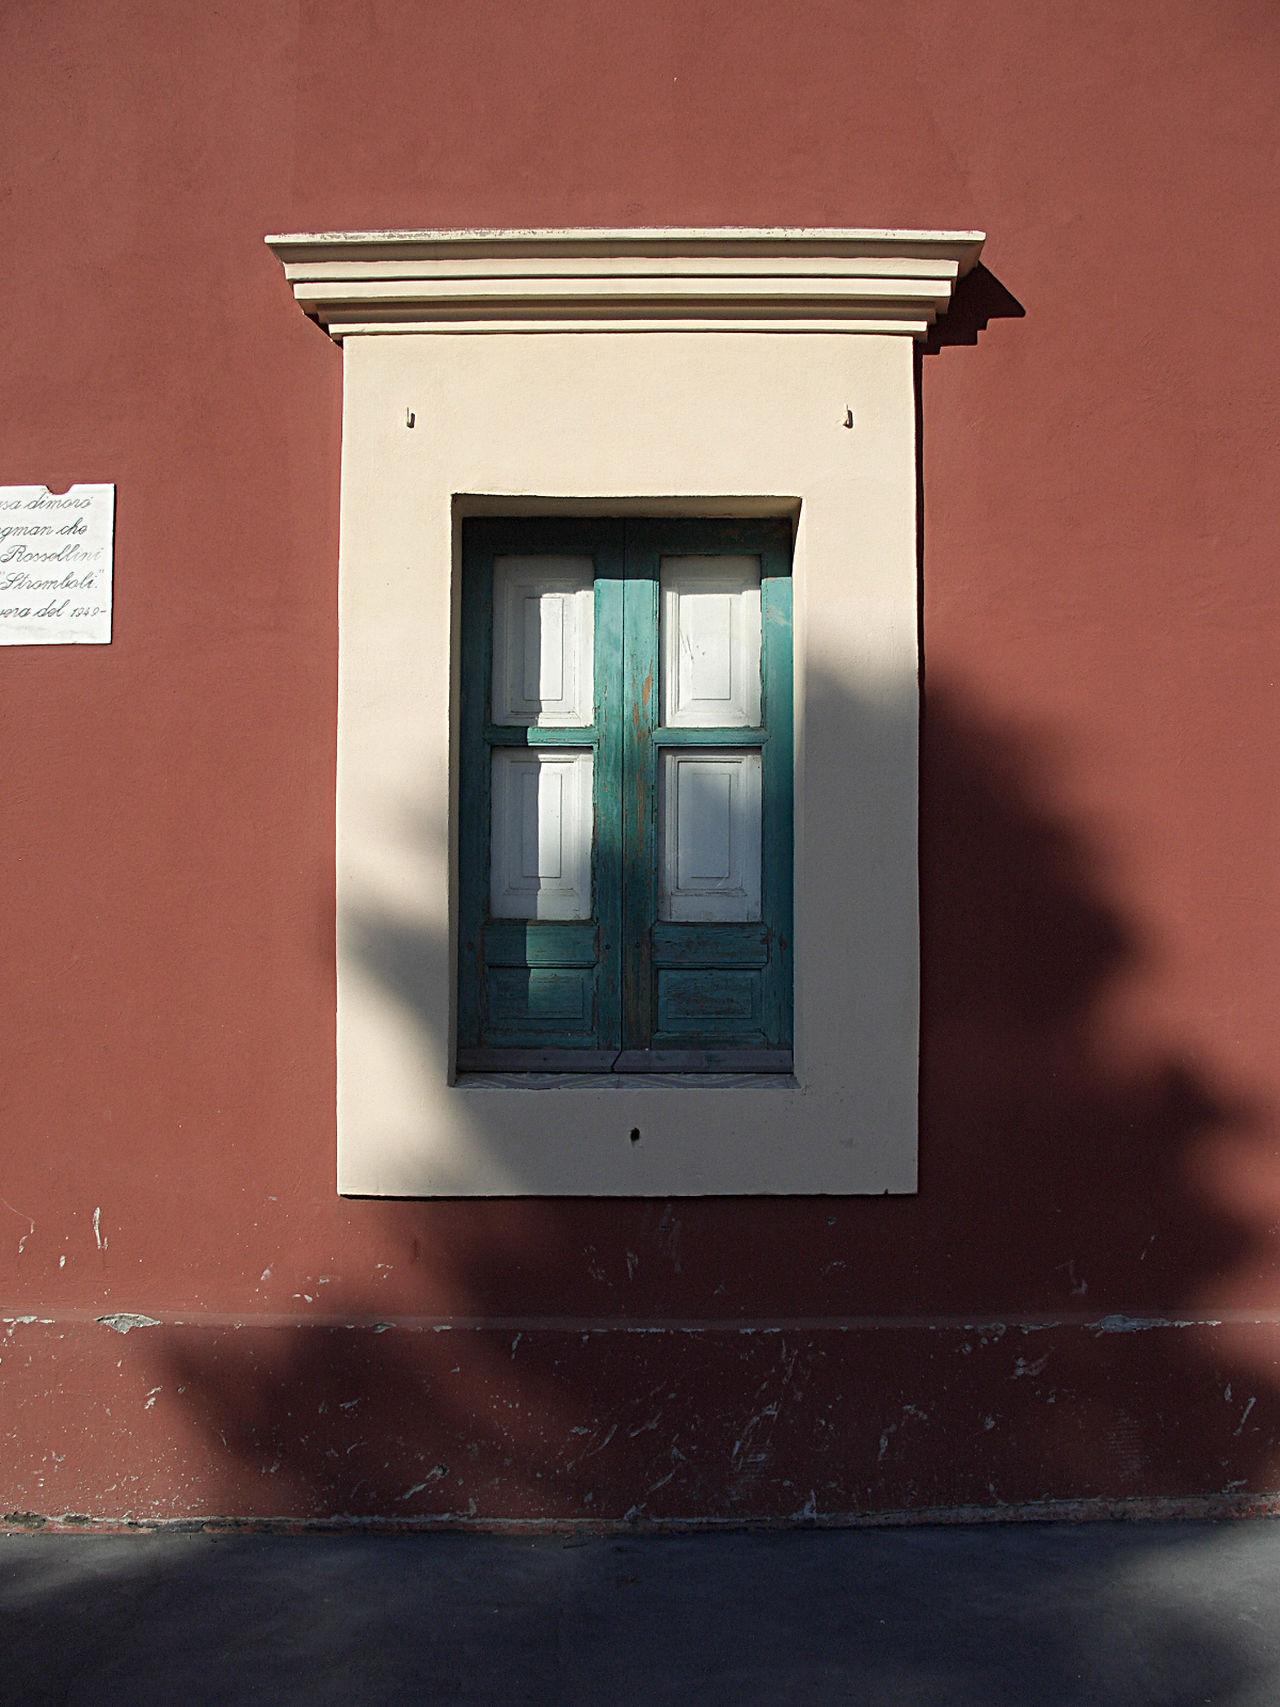 Architecture Eolian Islands Eolie Eolie Islands Ingrid Bergman Meditterranean Outdoors Red Stromboli Window